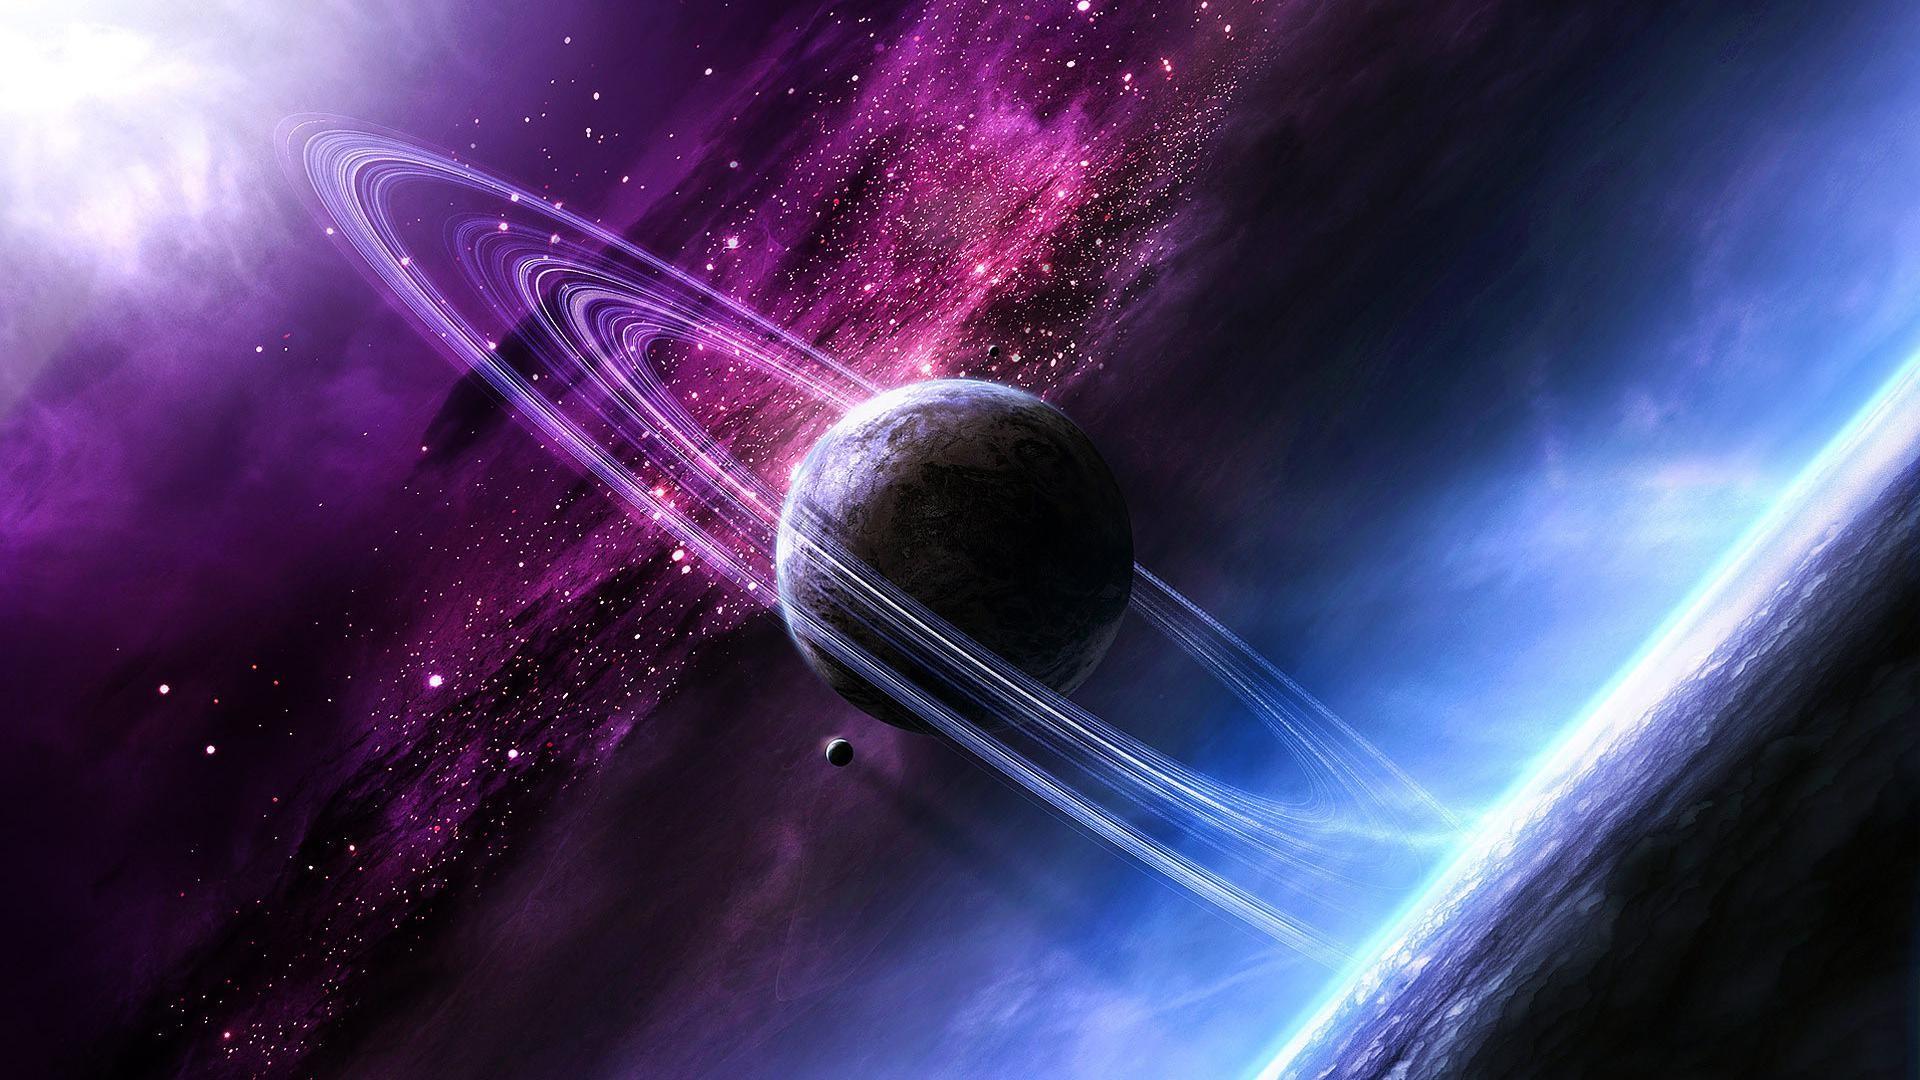 galaxy planet space vehicle purple stars nebula atmosphere planetary rings universe screenshot computer wallpaper atmosphere of